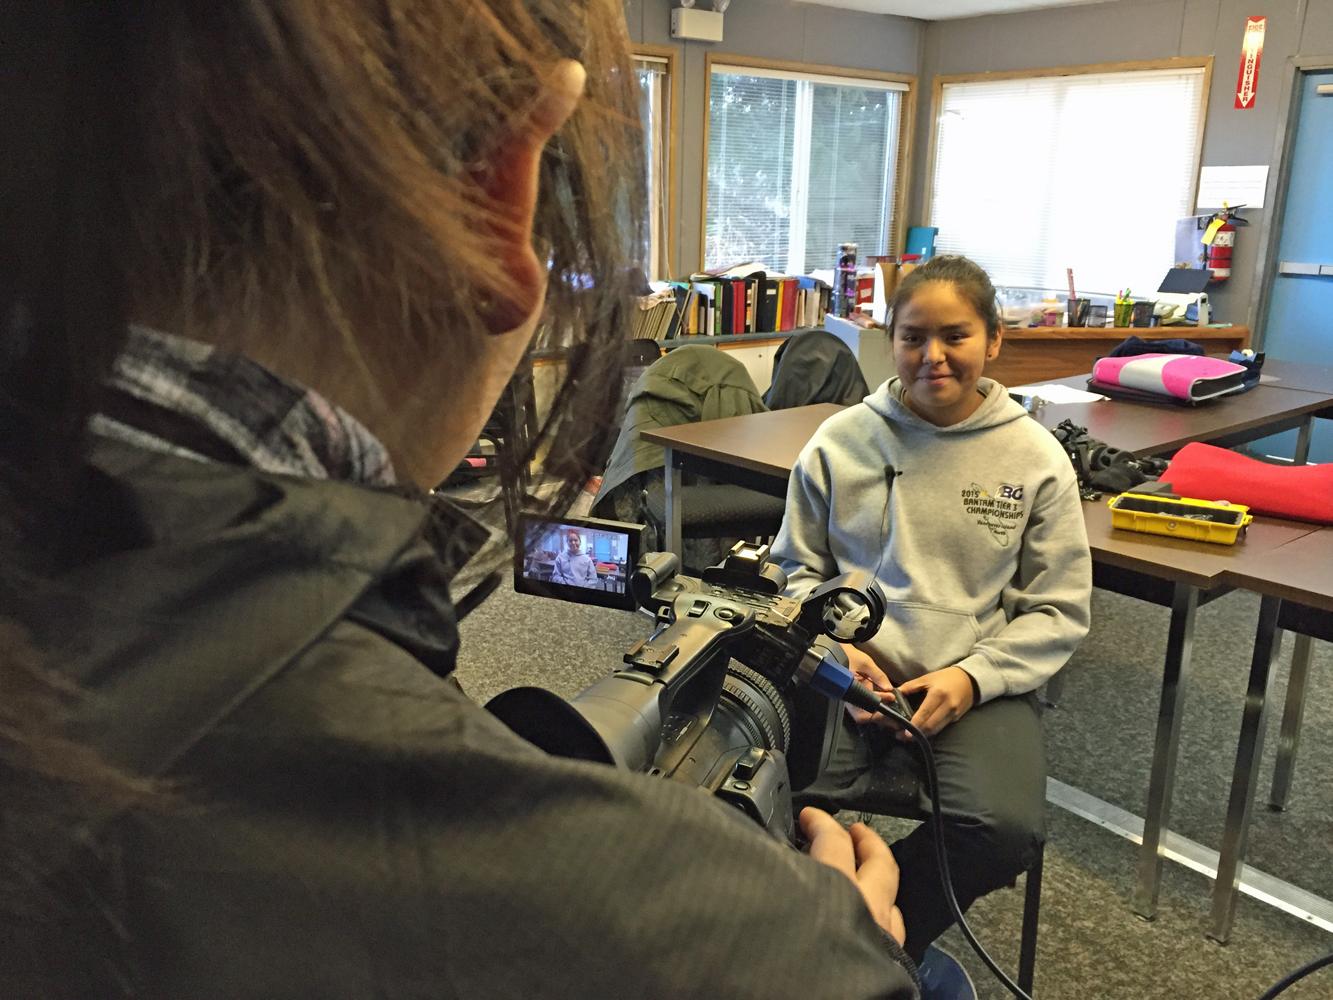 Kelly interviews Bree-Anna